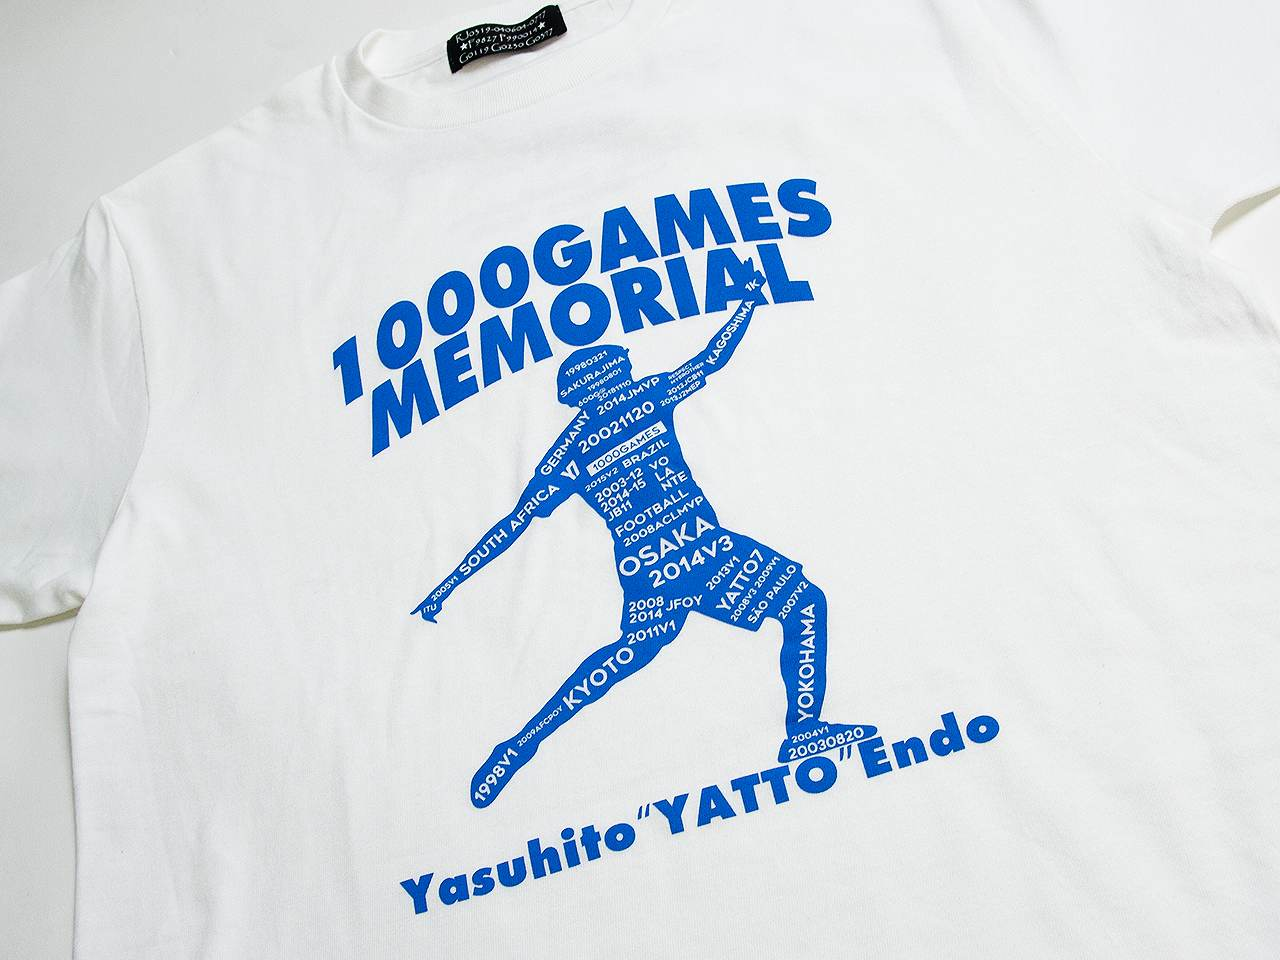 1000GAMES-TS